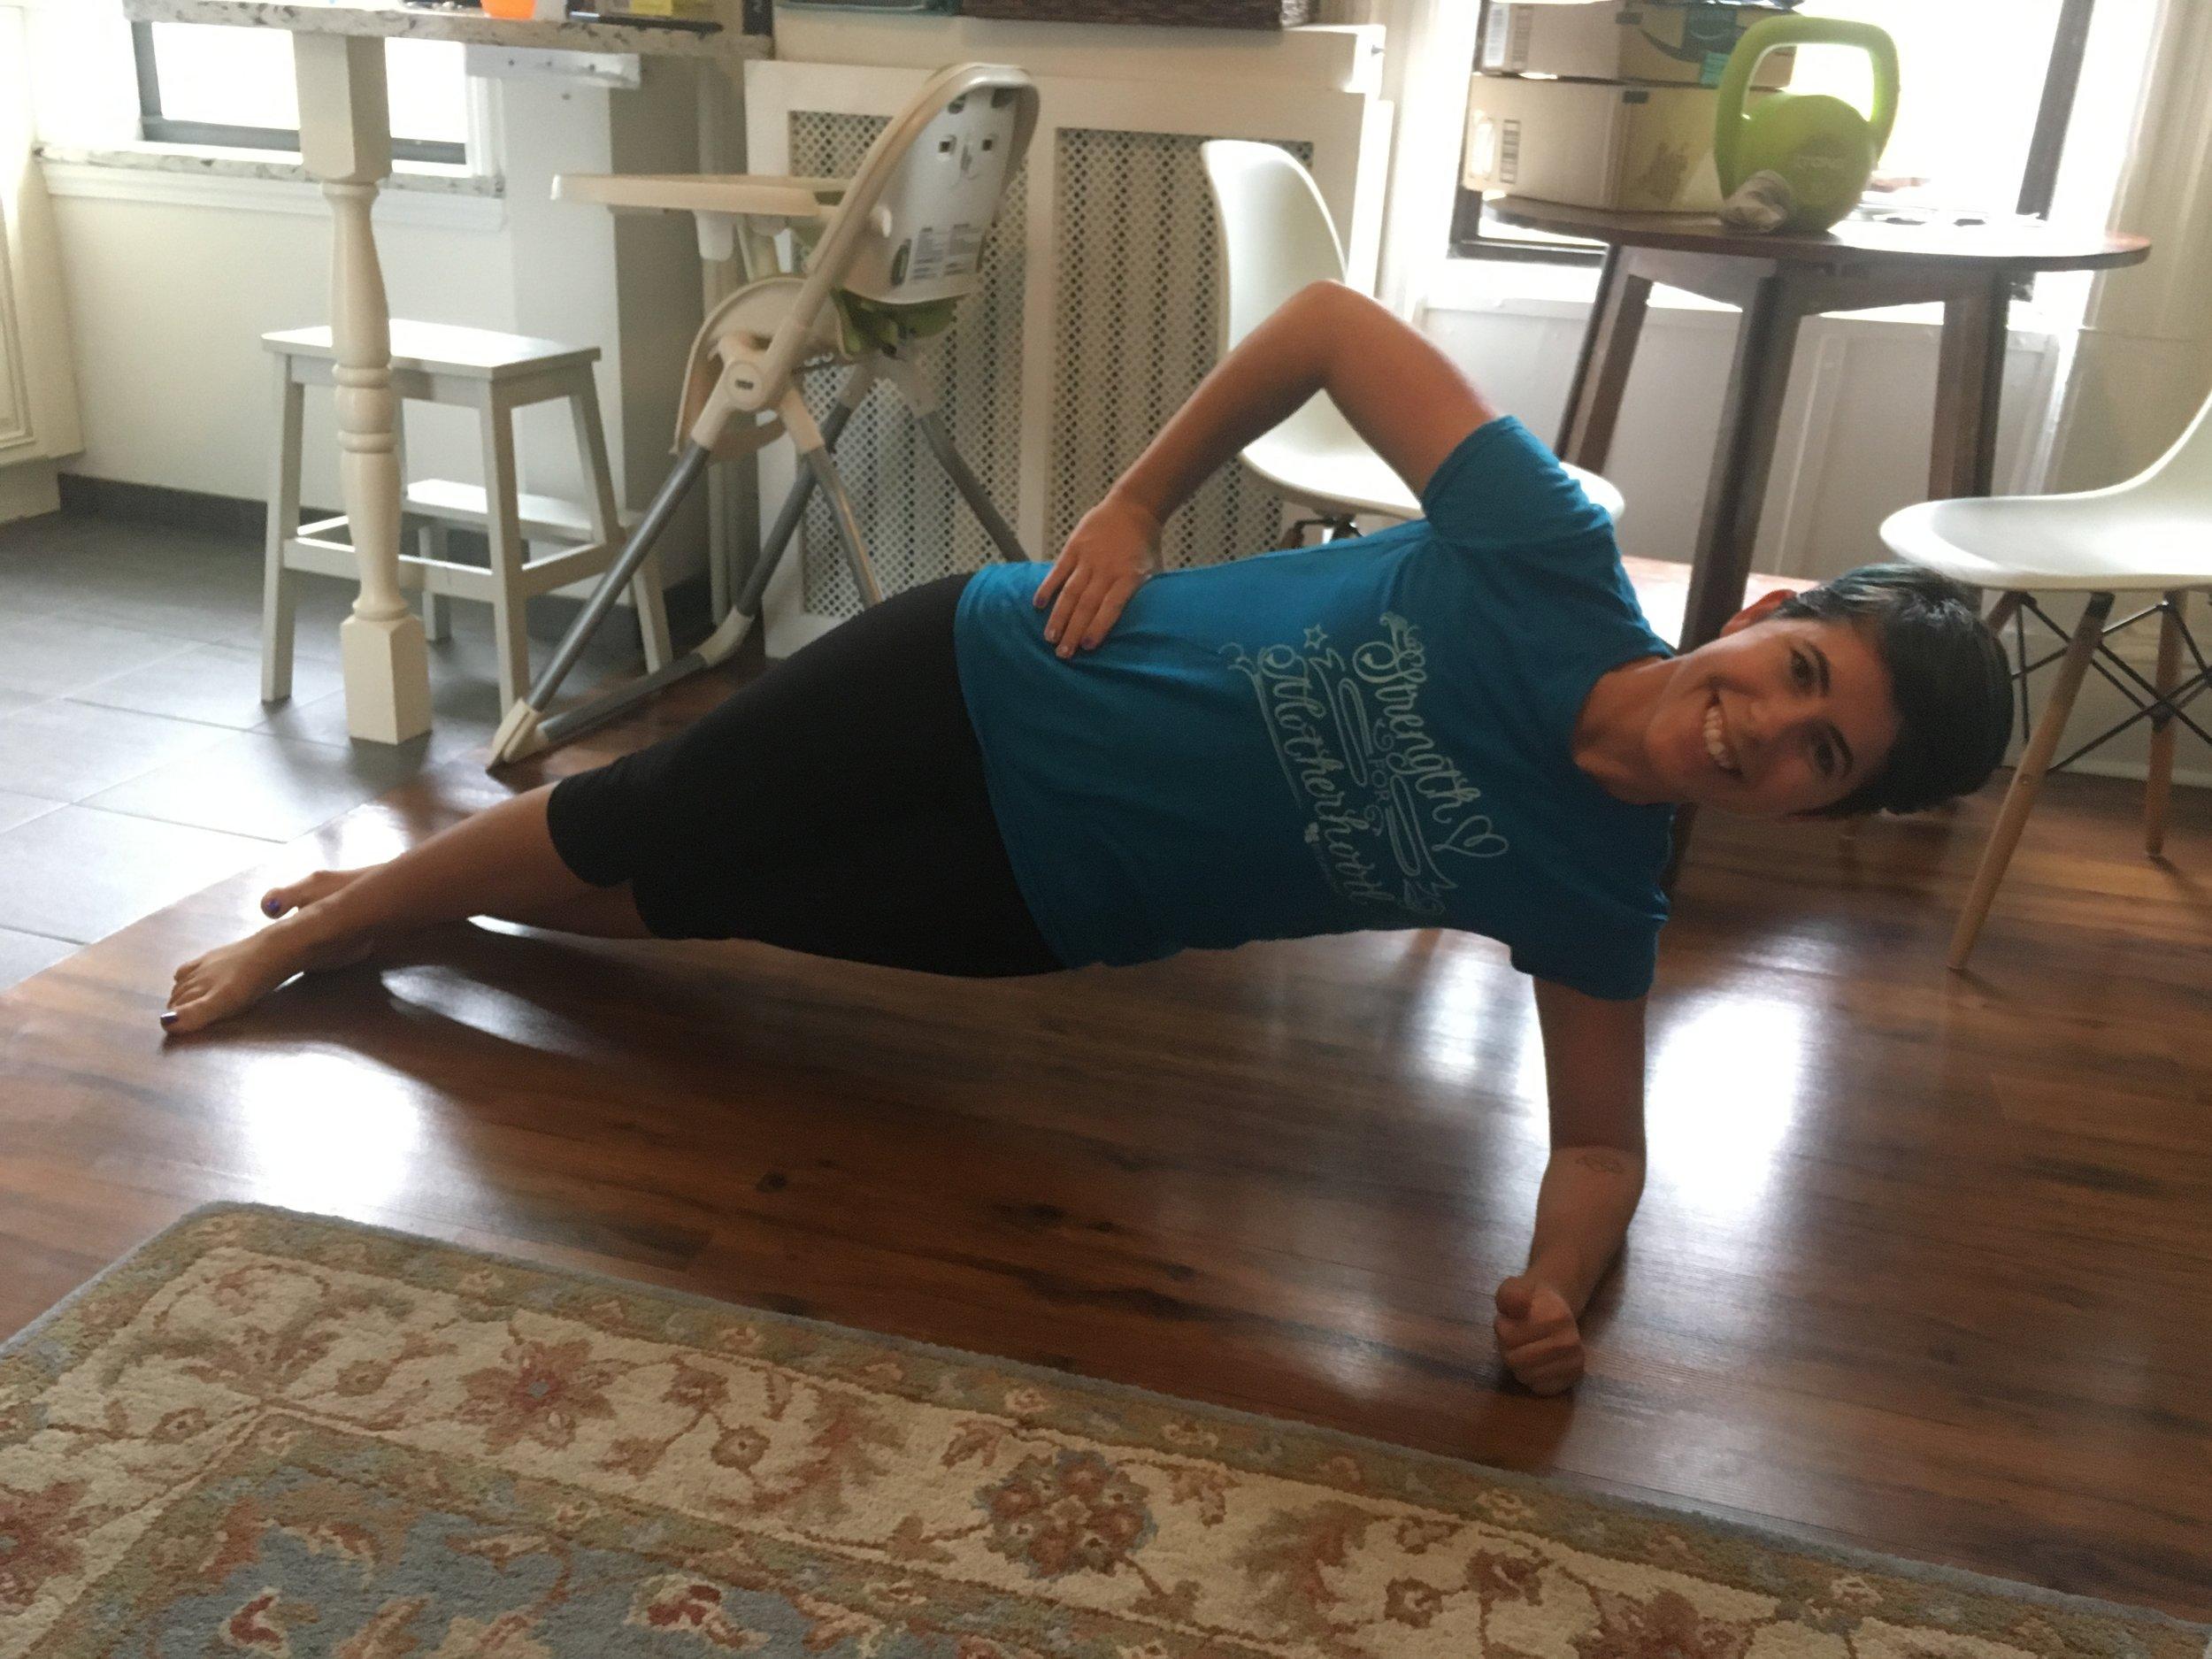 Living Room workout - not where I teach Stroller Strides :-)